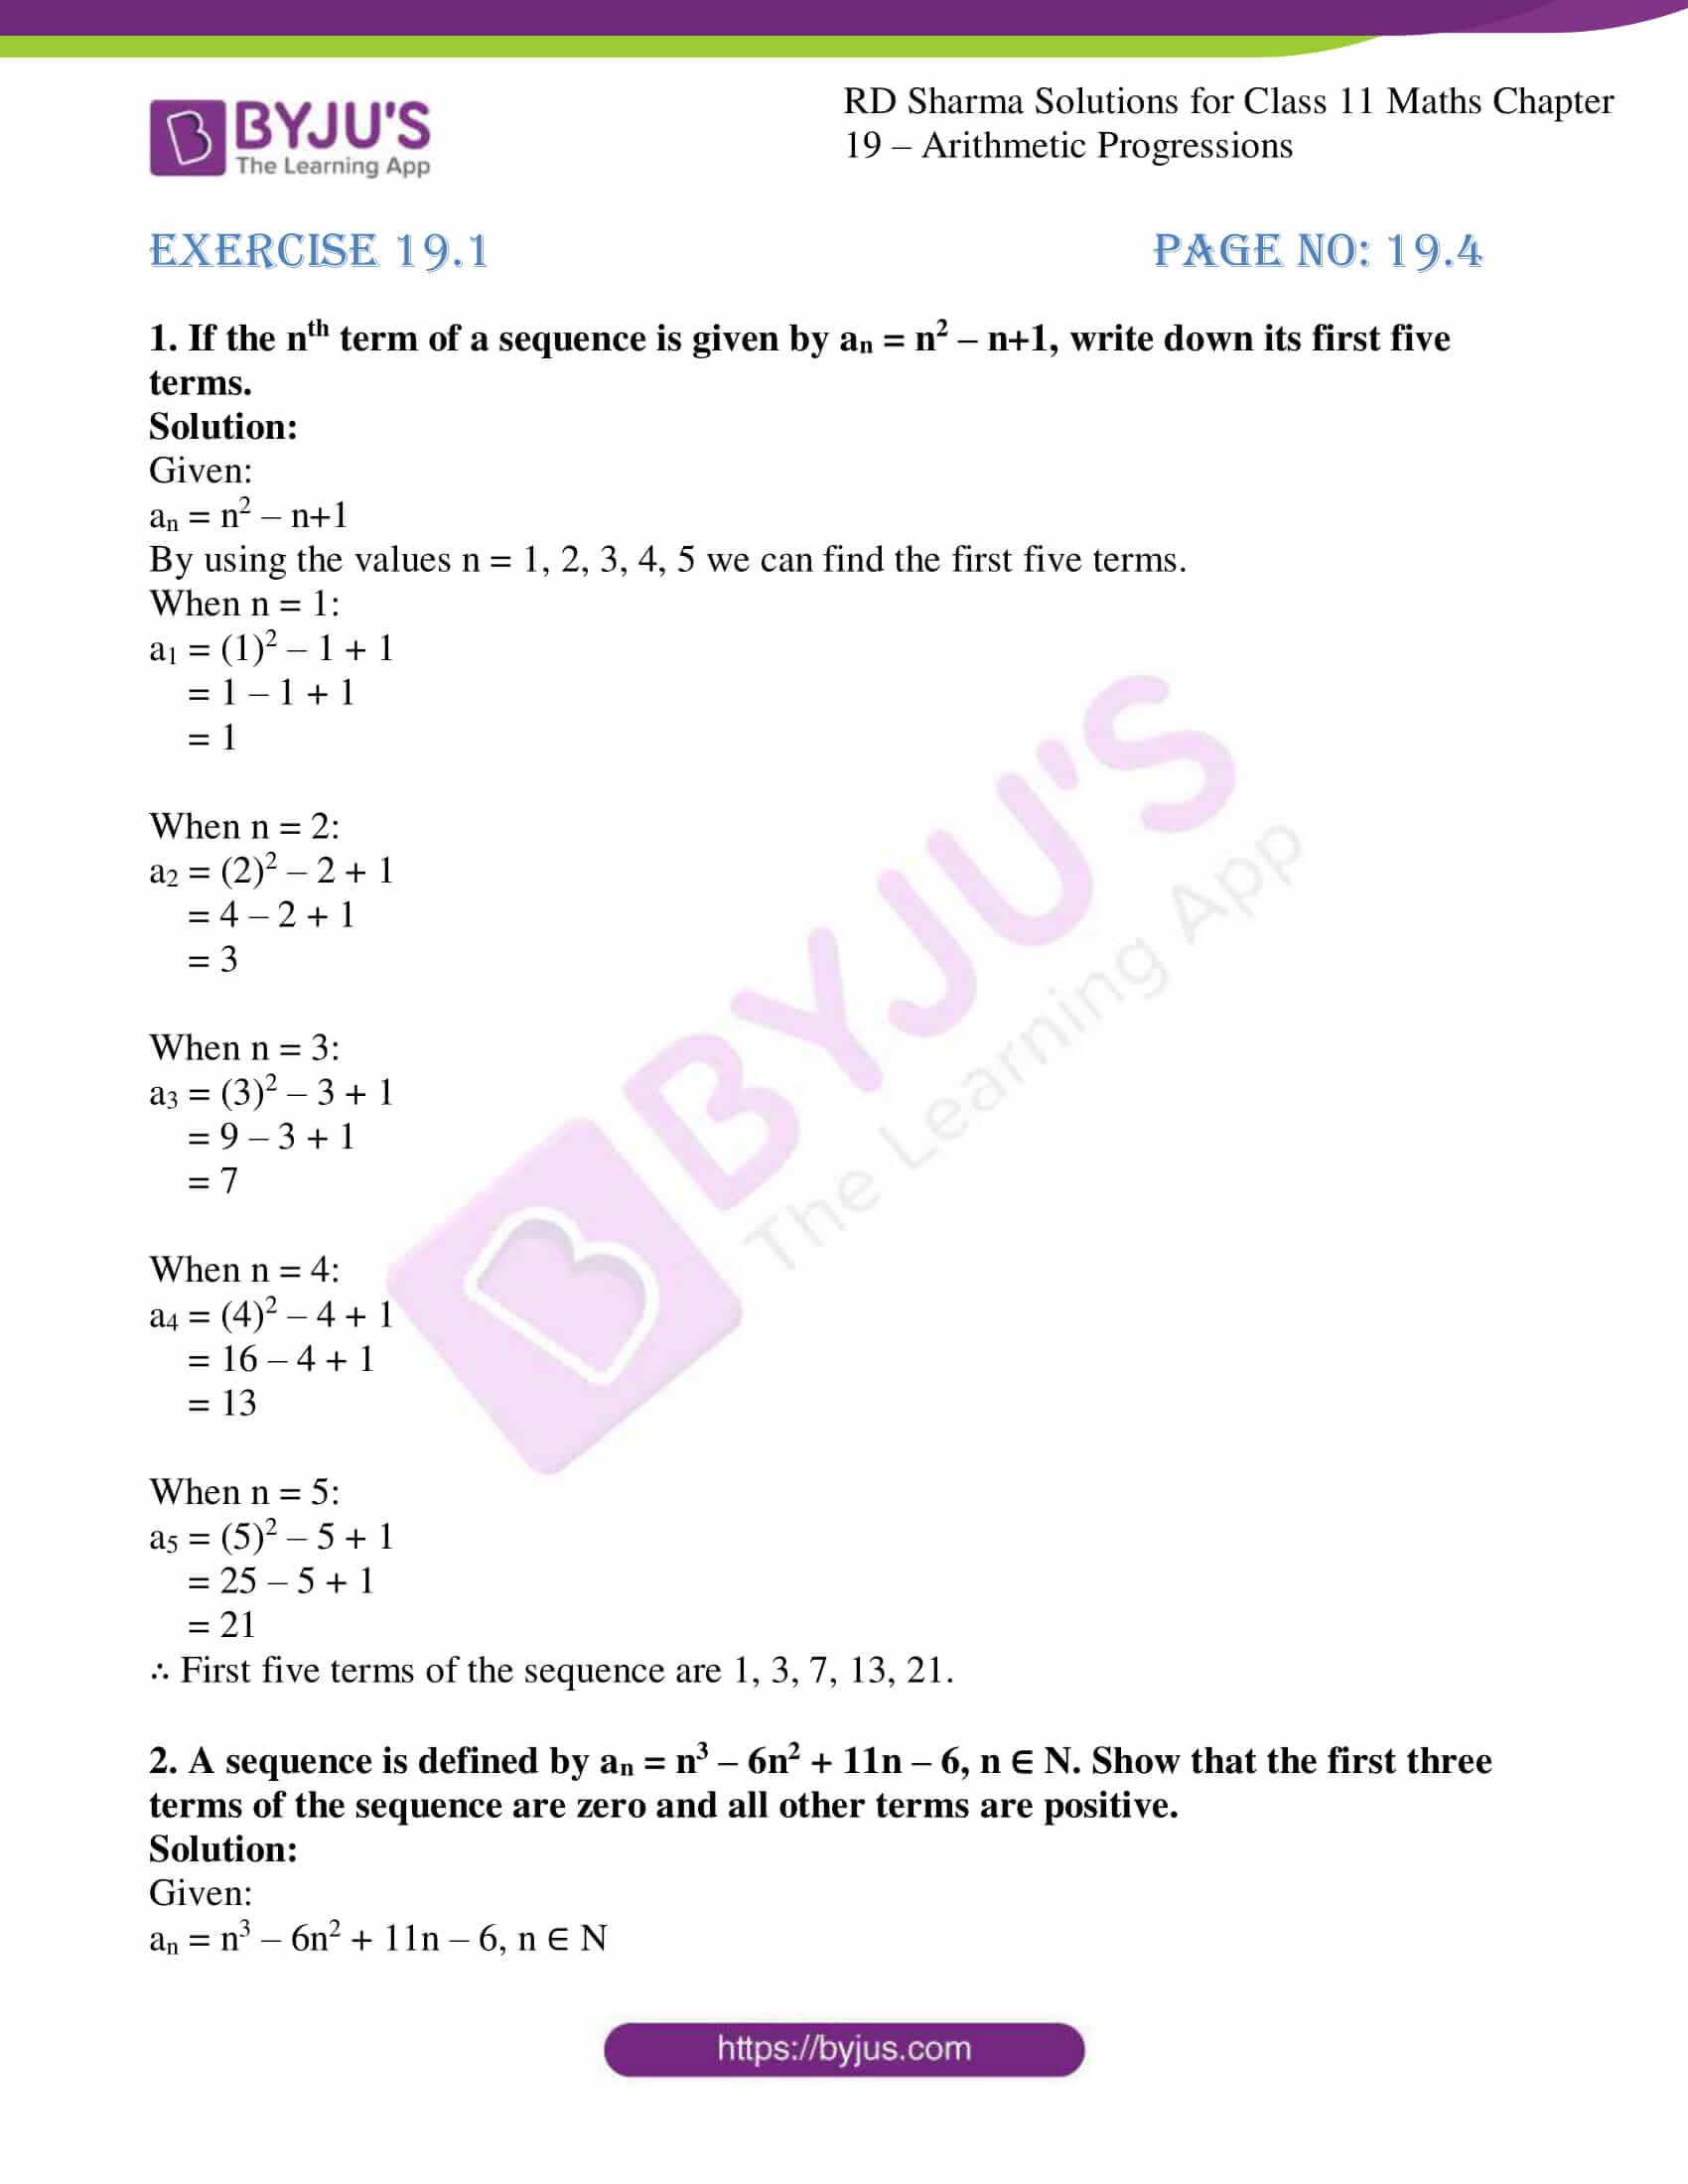 rd sharma class 11 maths ch 19 ex 1 1